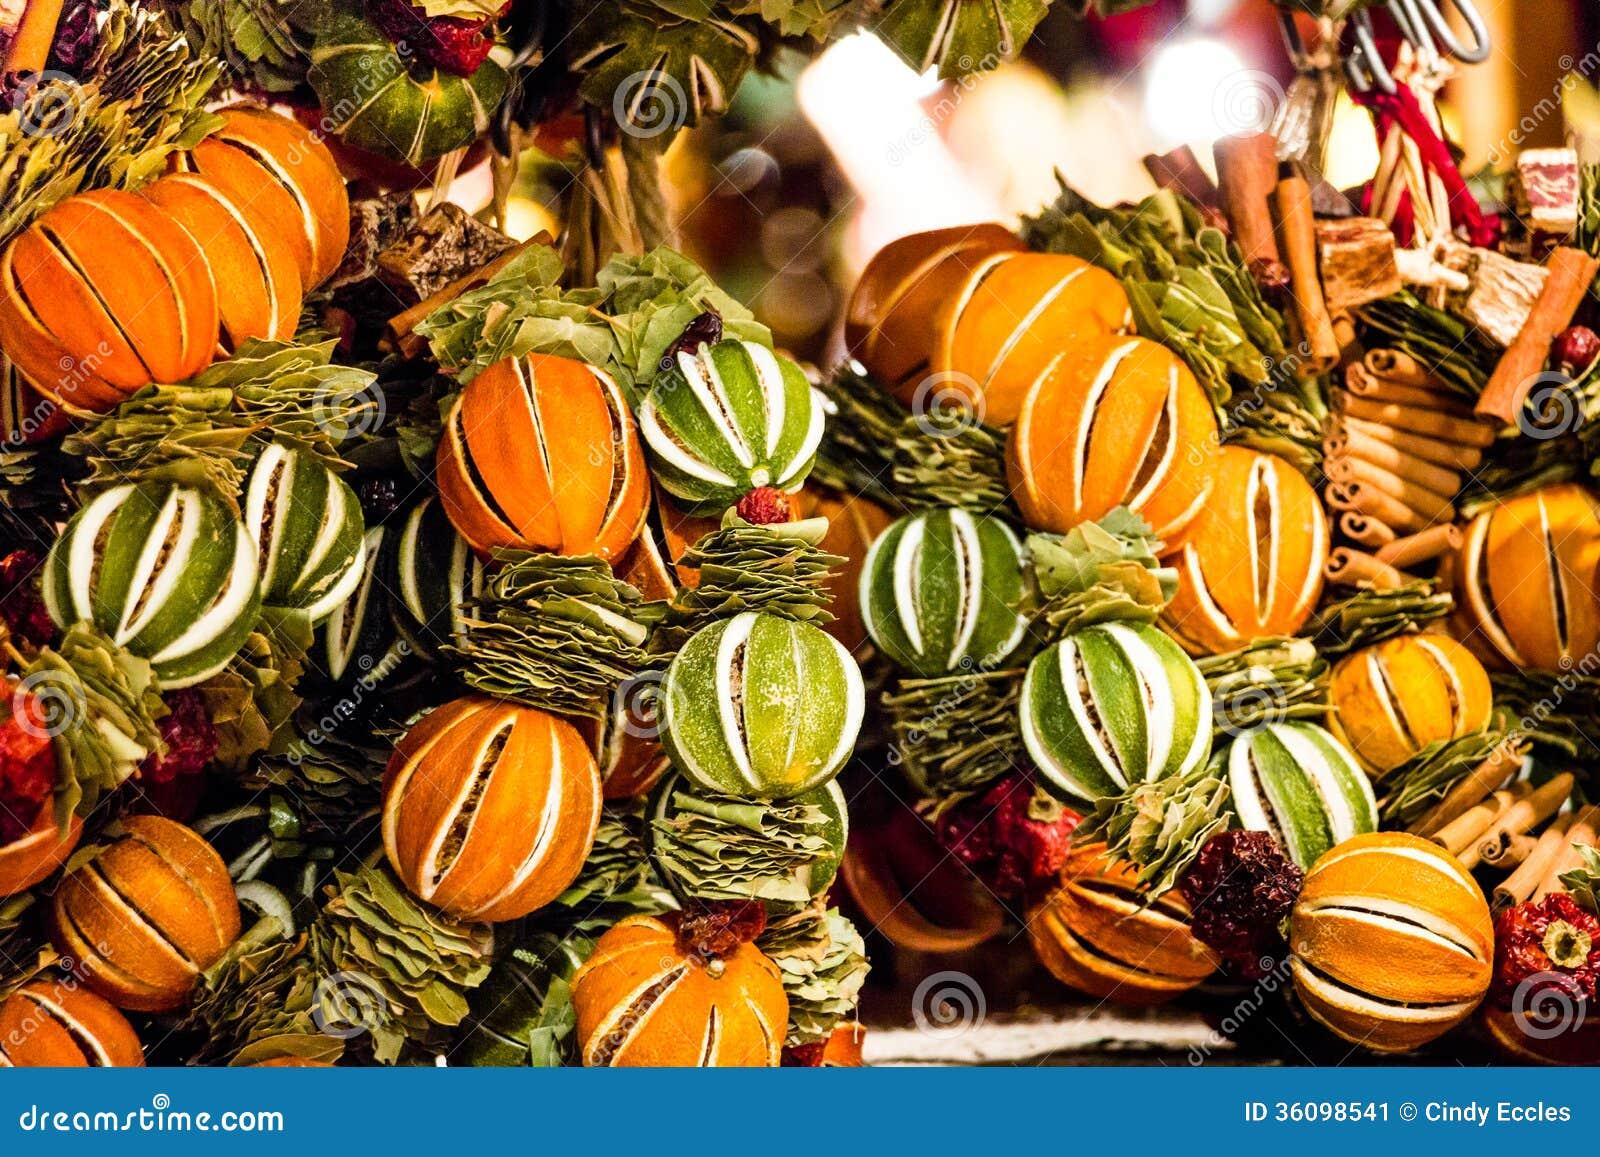 Christmas Tree Orange Decorations